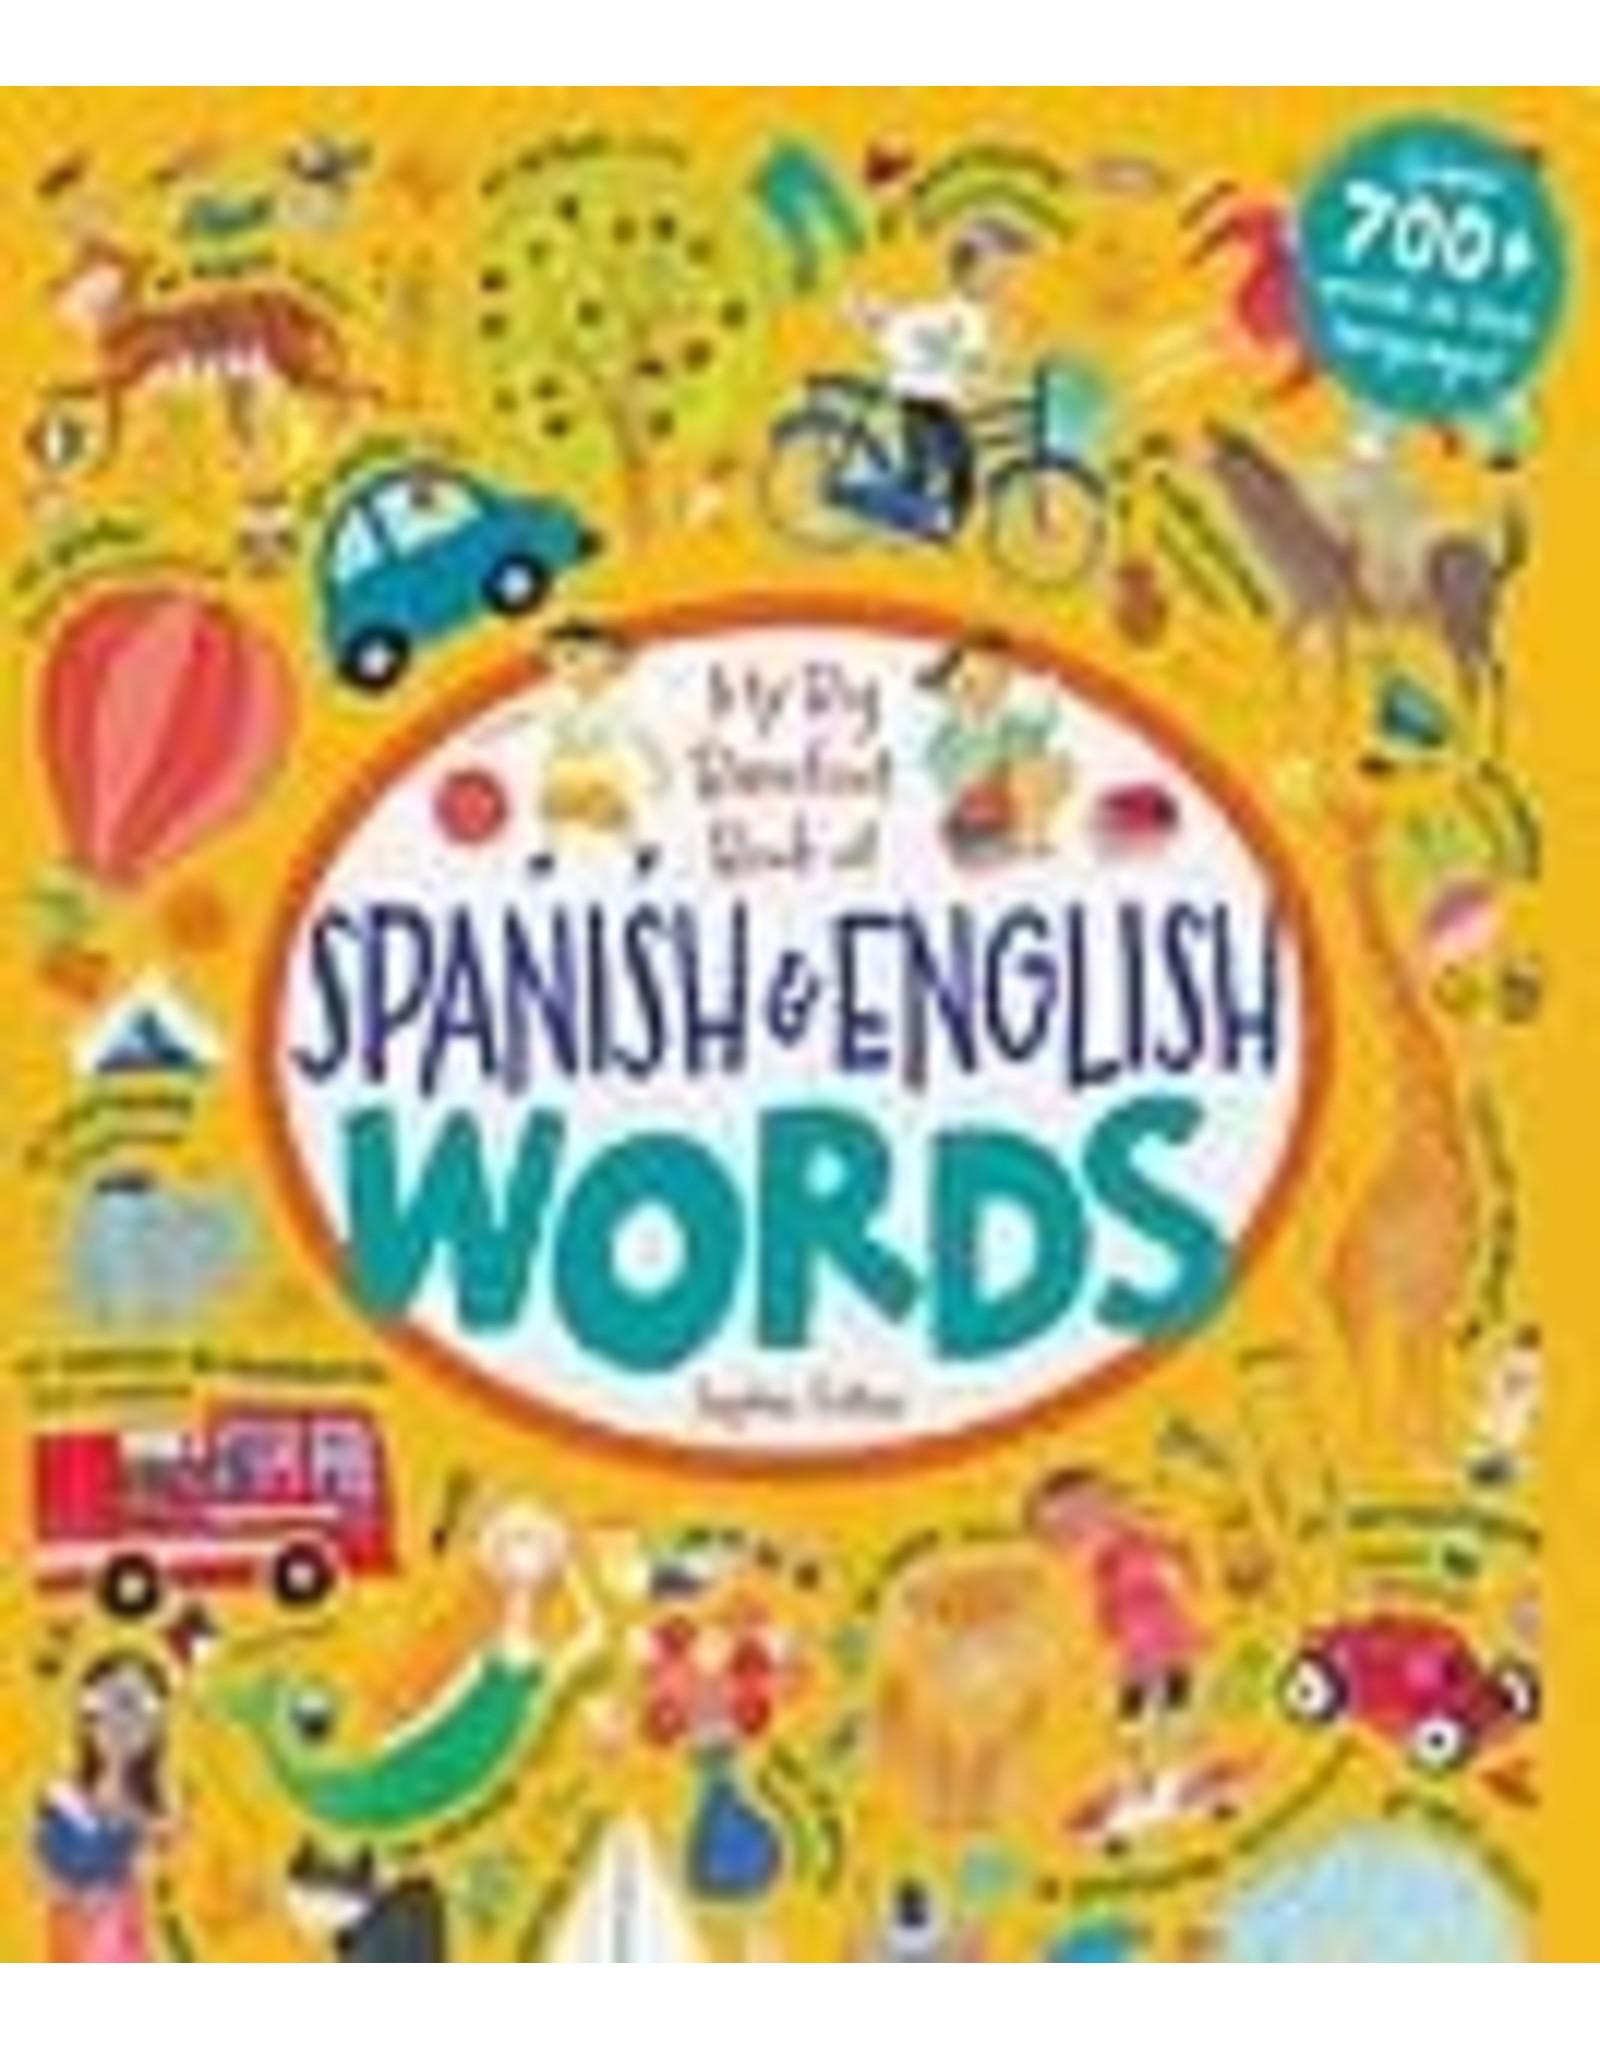 Putumayo, Barefoot Spanish & English Words Book